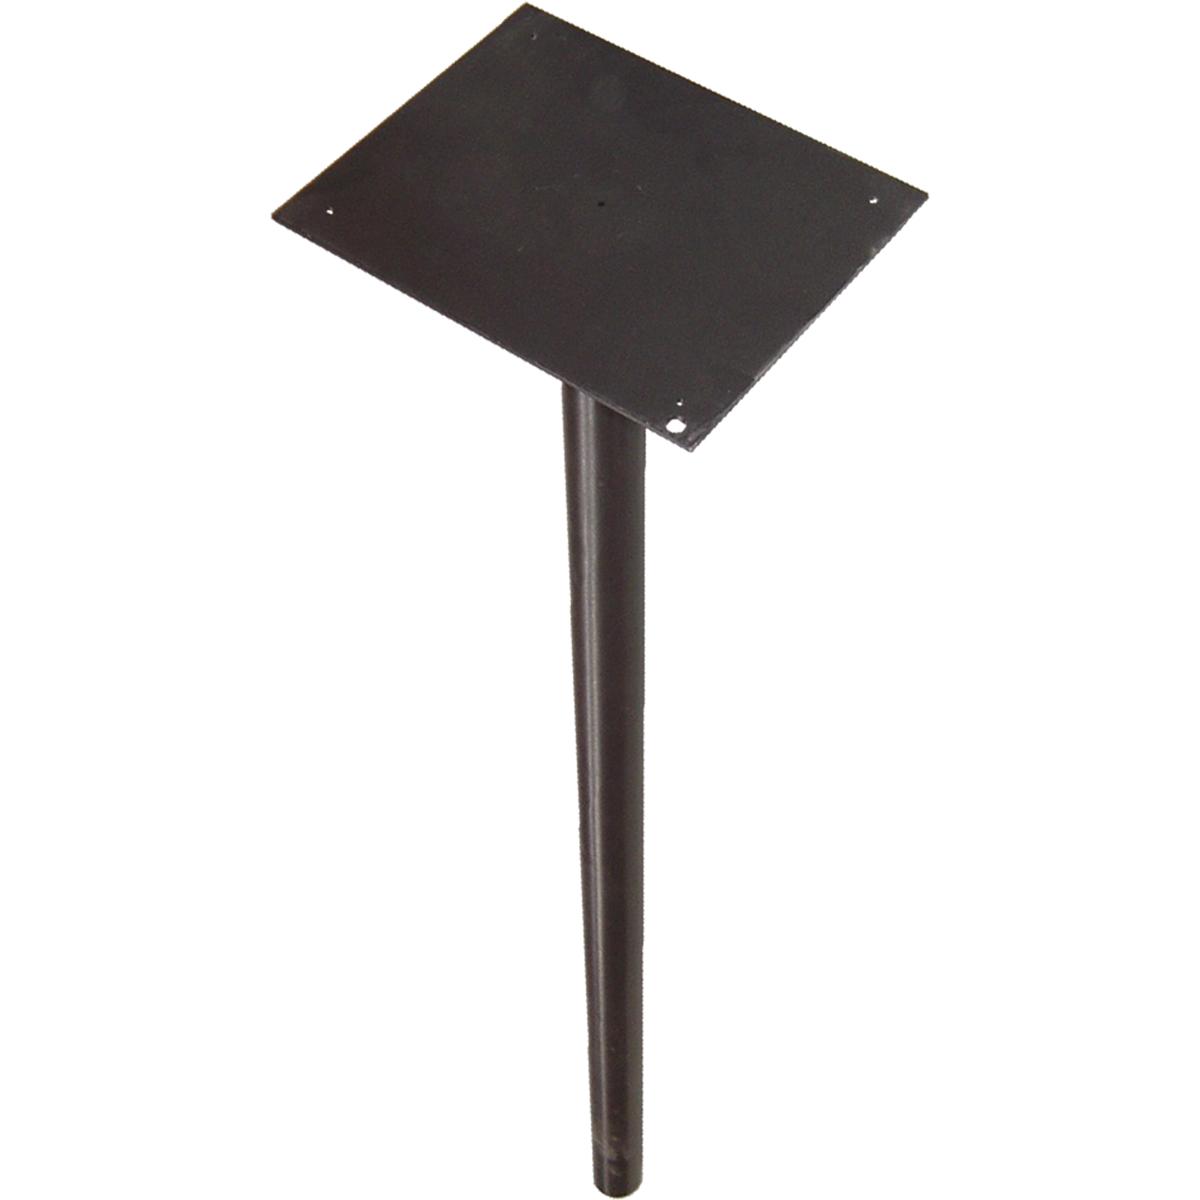 PinPod Hi Mounting Pole